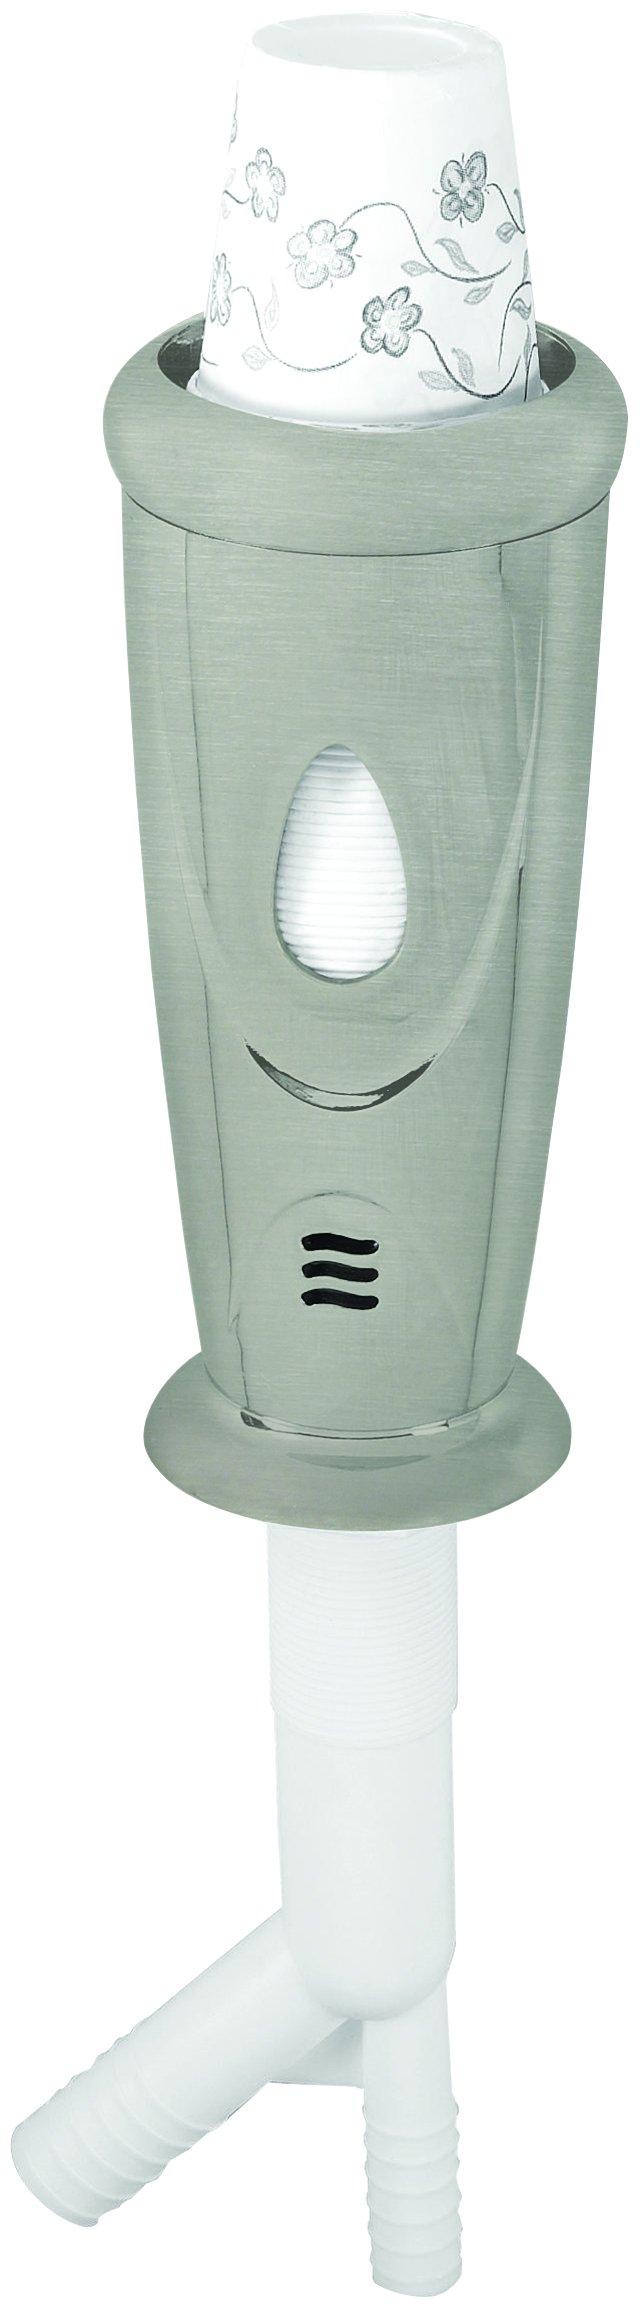 Nickel Kitchen Paper Cup Dispenser/Dishwasher Air Gap by Westbrass (Image #1)